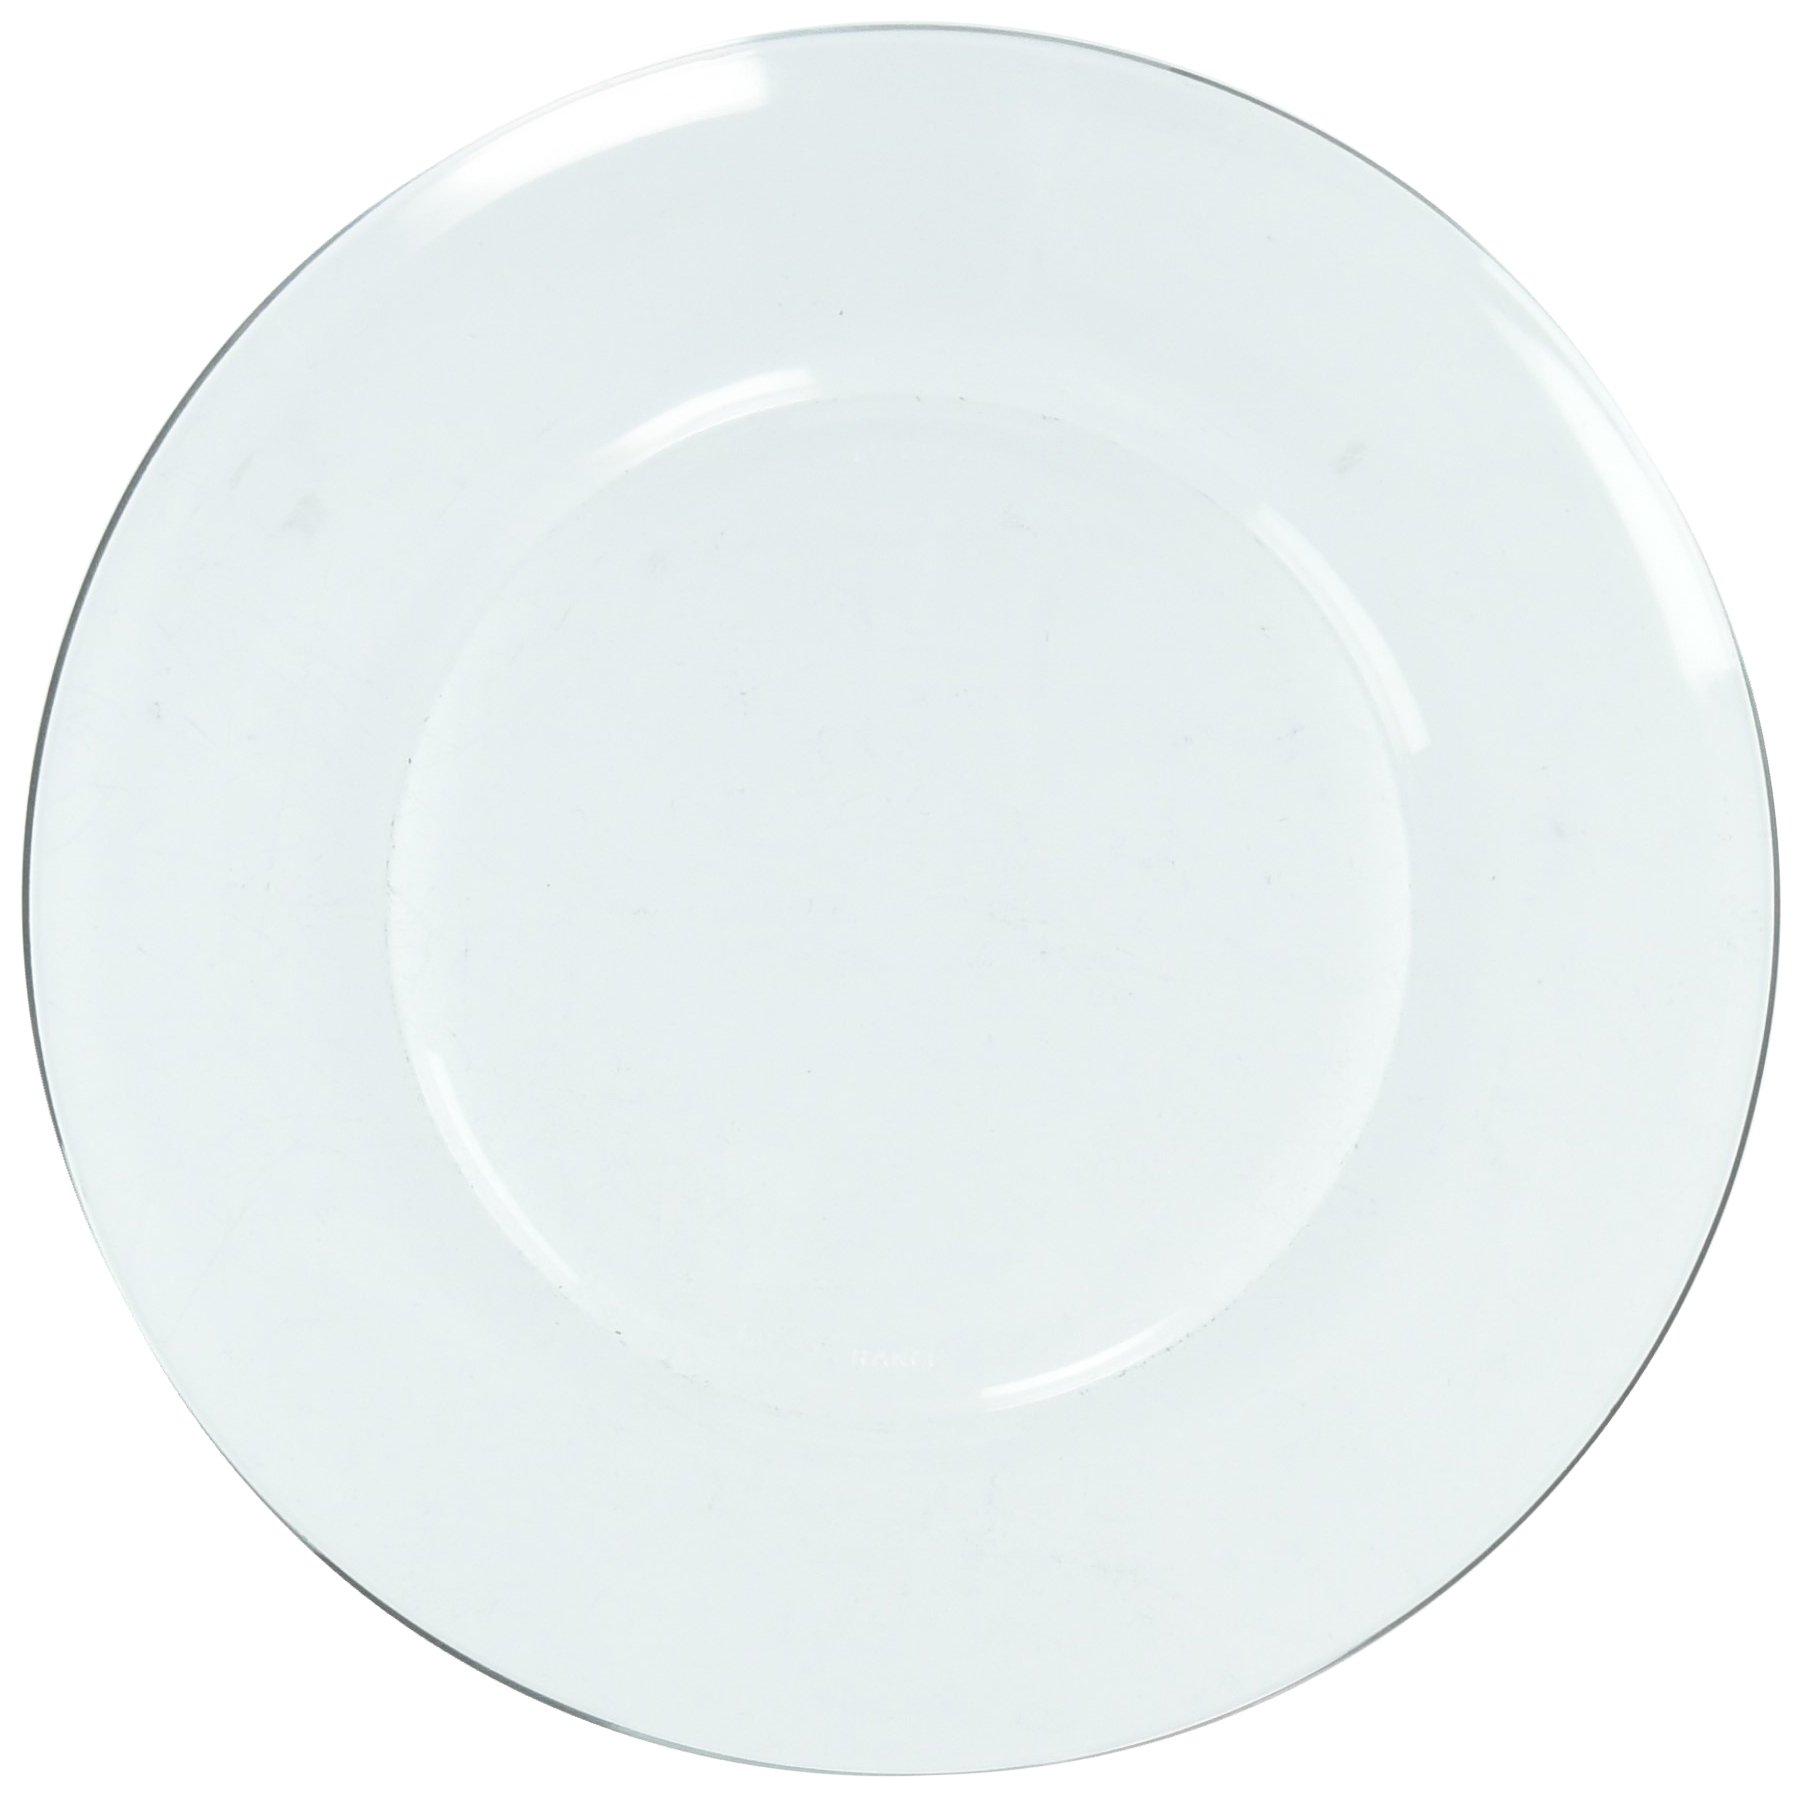 Duralex Made In France 3008AF06/4 Lys Dinnerware 7-1/2 Inch Salad /Dessert Plate.Set of 4